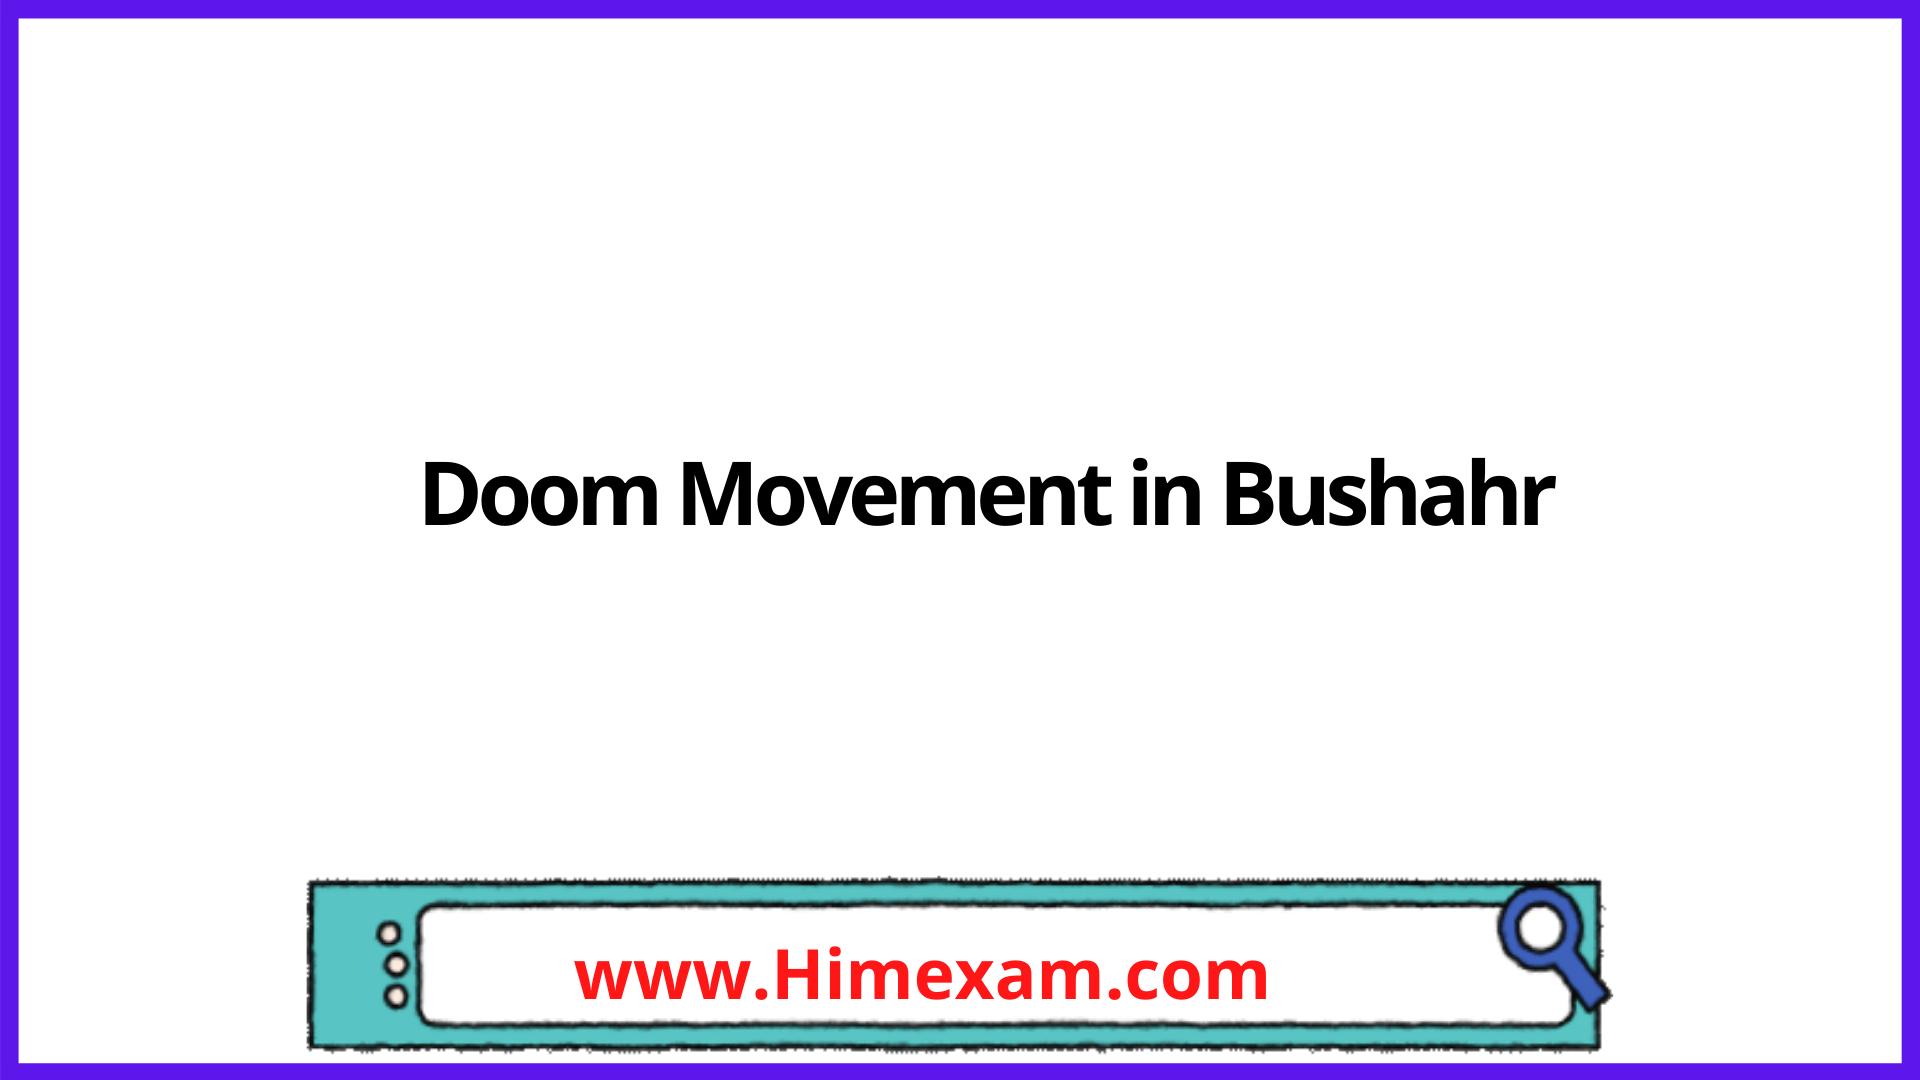 Doom Movement in Bushahr